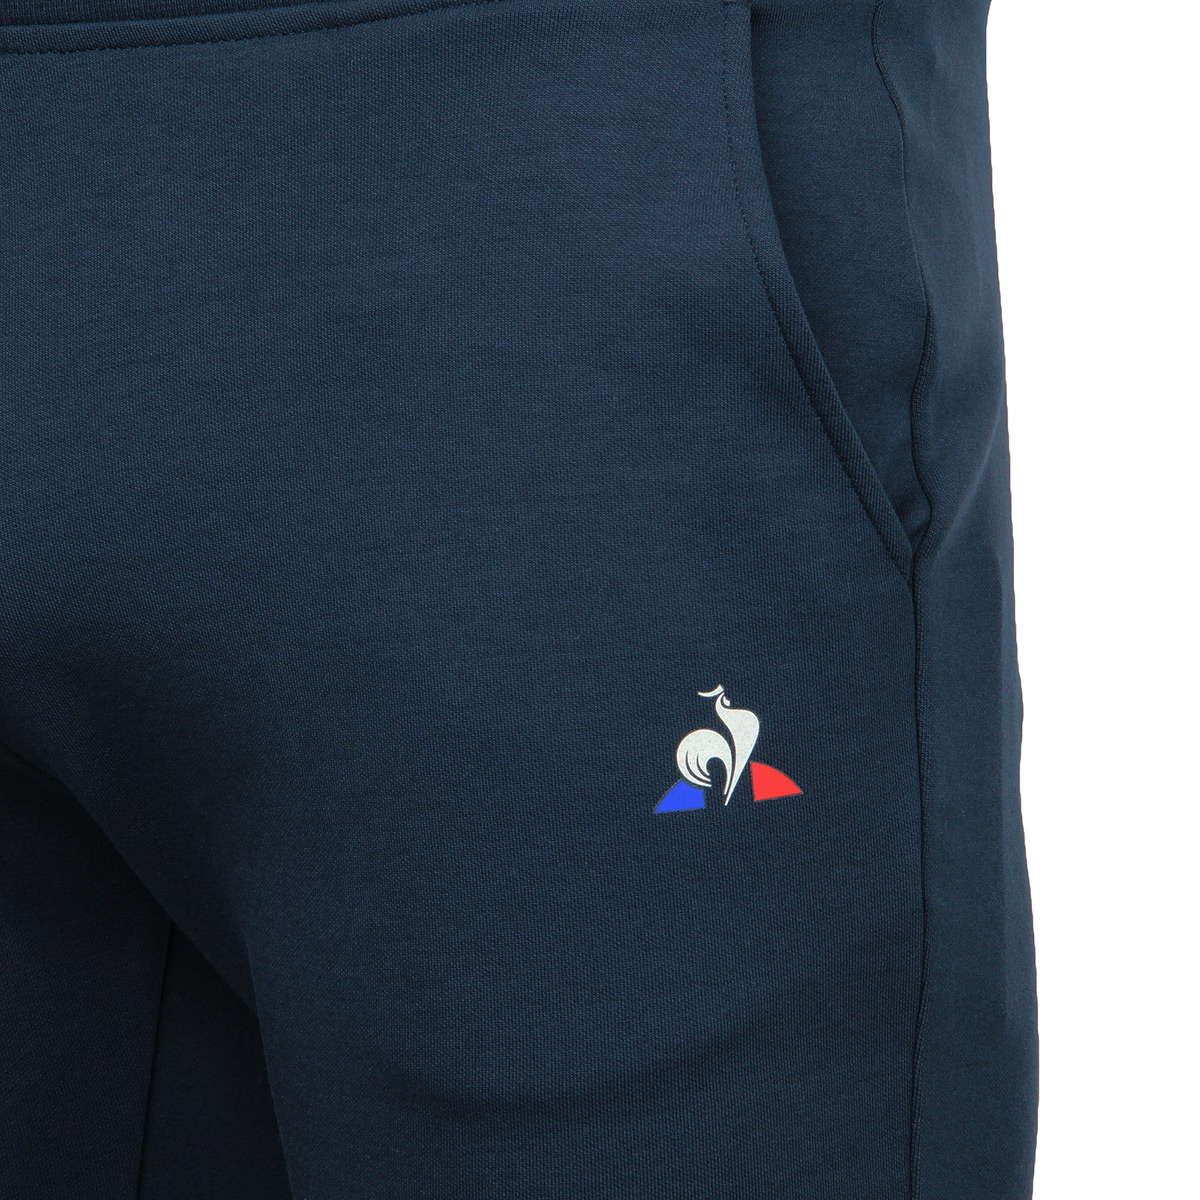 Le Coq Sportif Ess Pant Slim n°1 Mdress blues 1810510, Pantalons homme